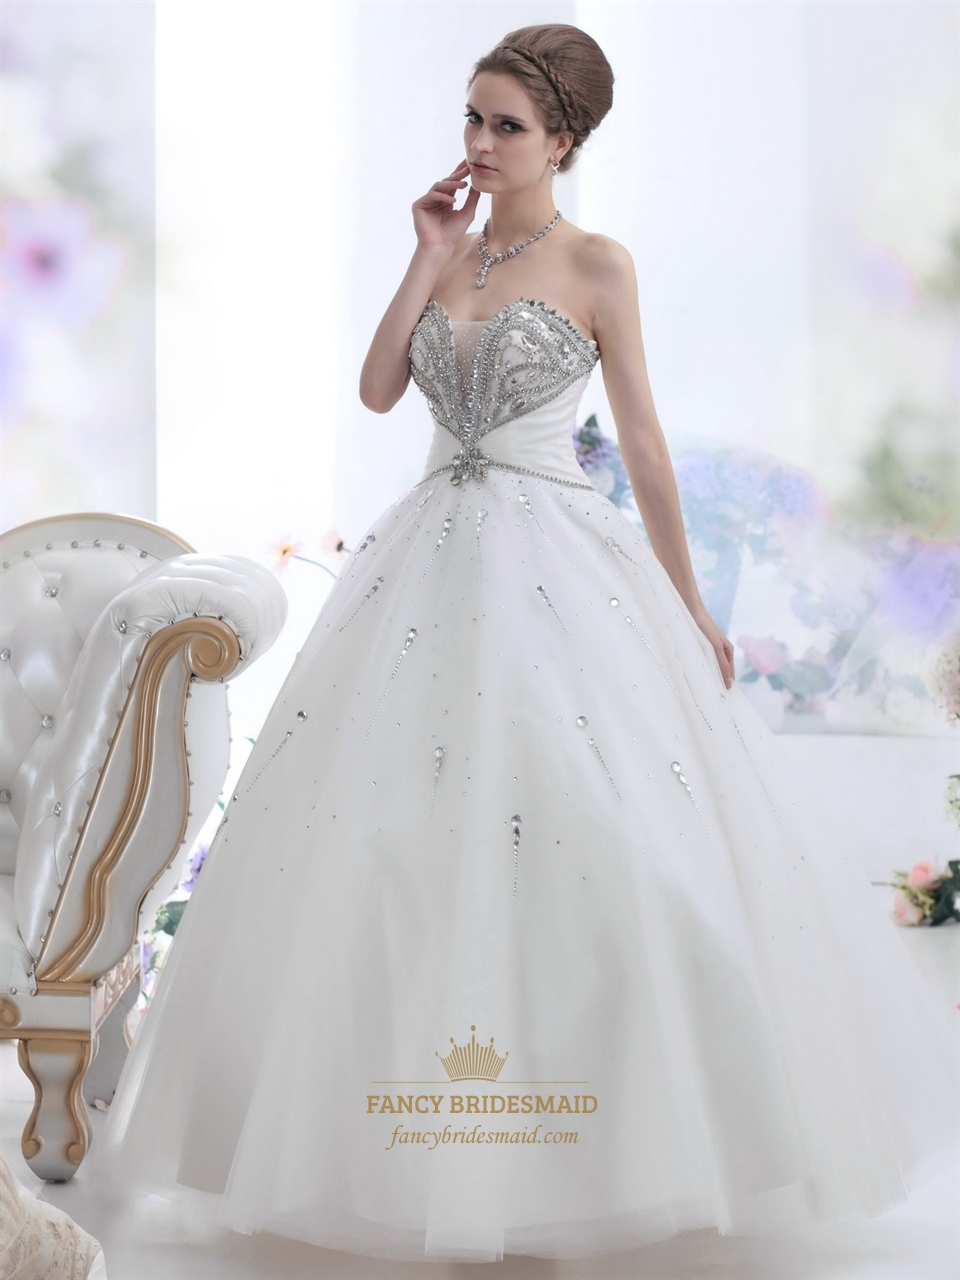 When should i buy my wedding dress